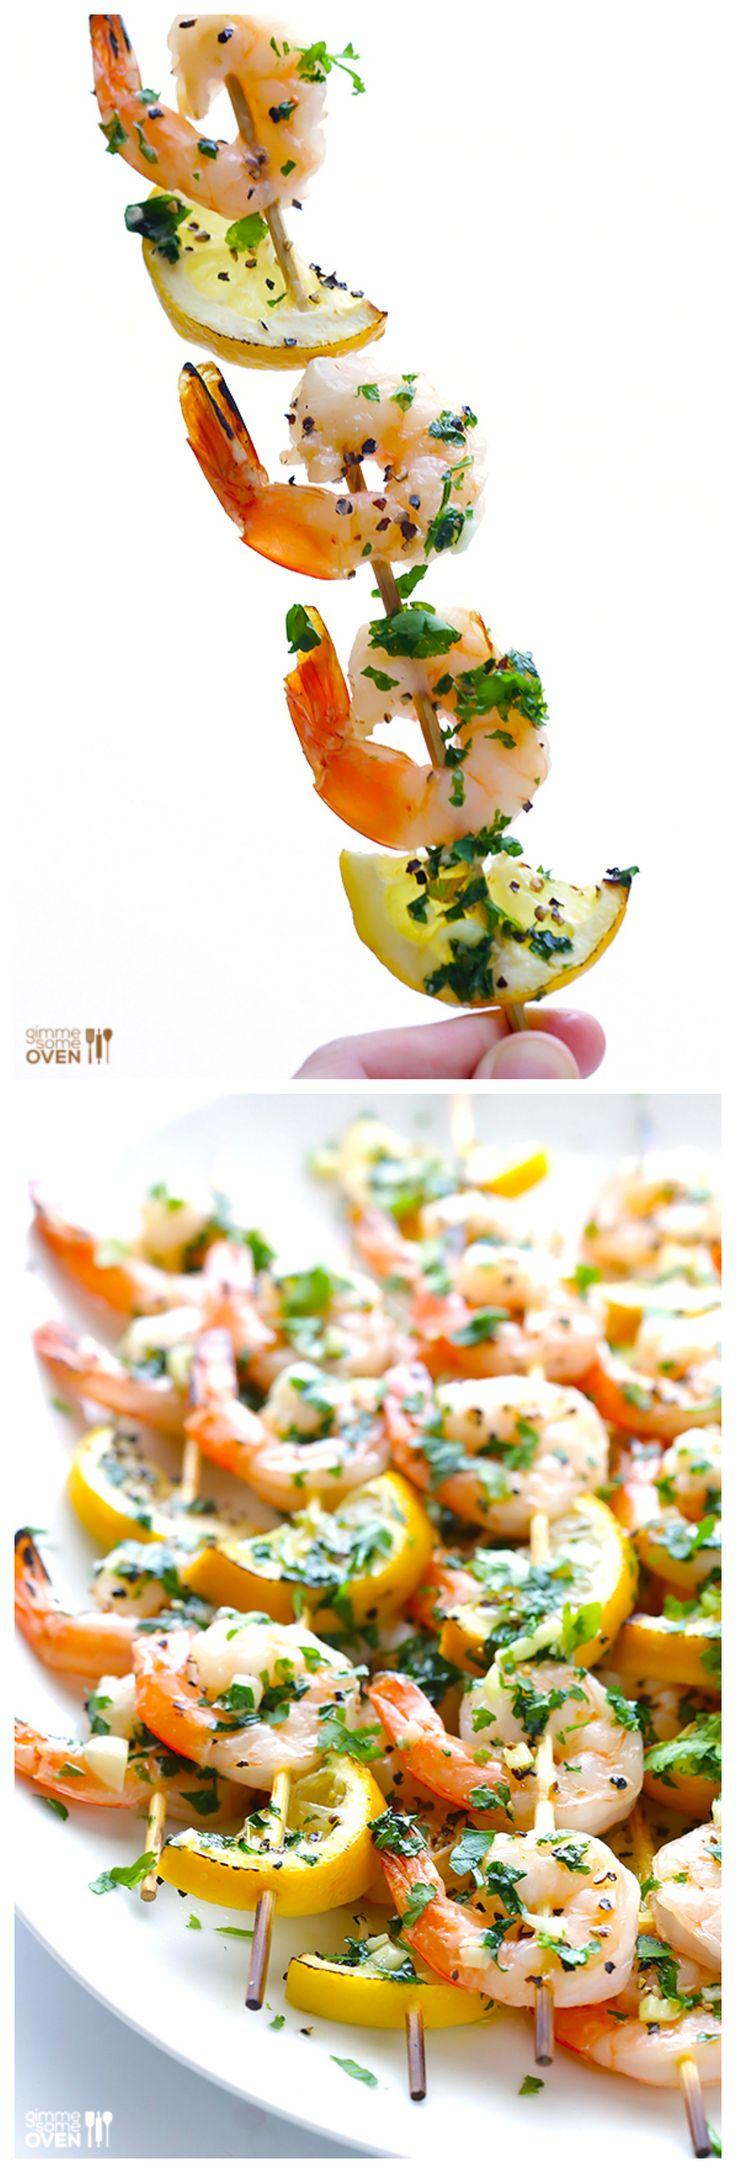 Shrimp Scampi Skewers -- All of the goodness of shrimp scampi, but grilled on skewers!  | gimmesomeoven.com